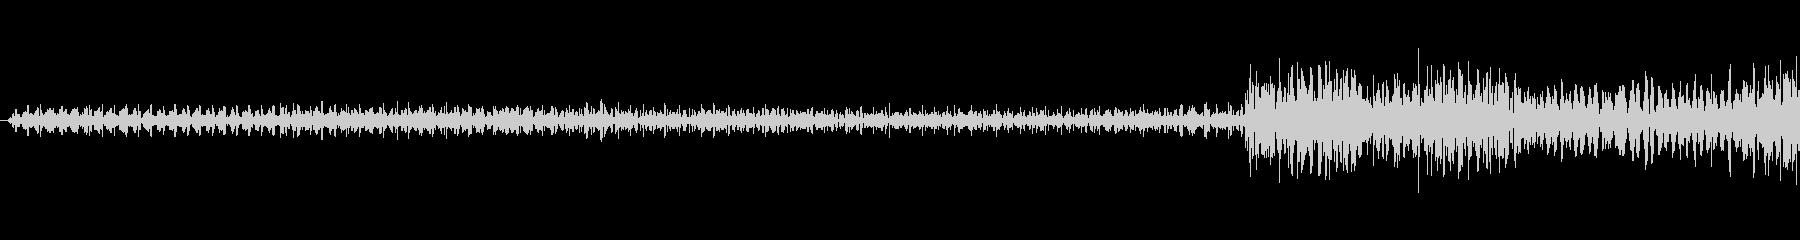 SciFi EC01_87_2の未再生の波形